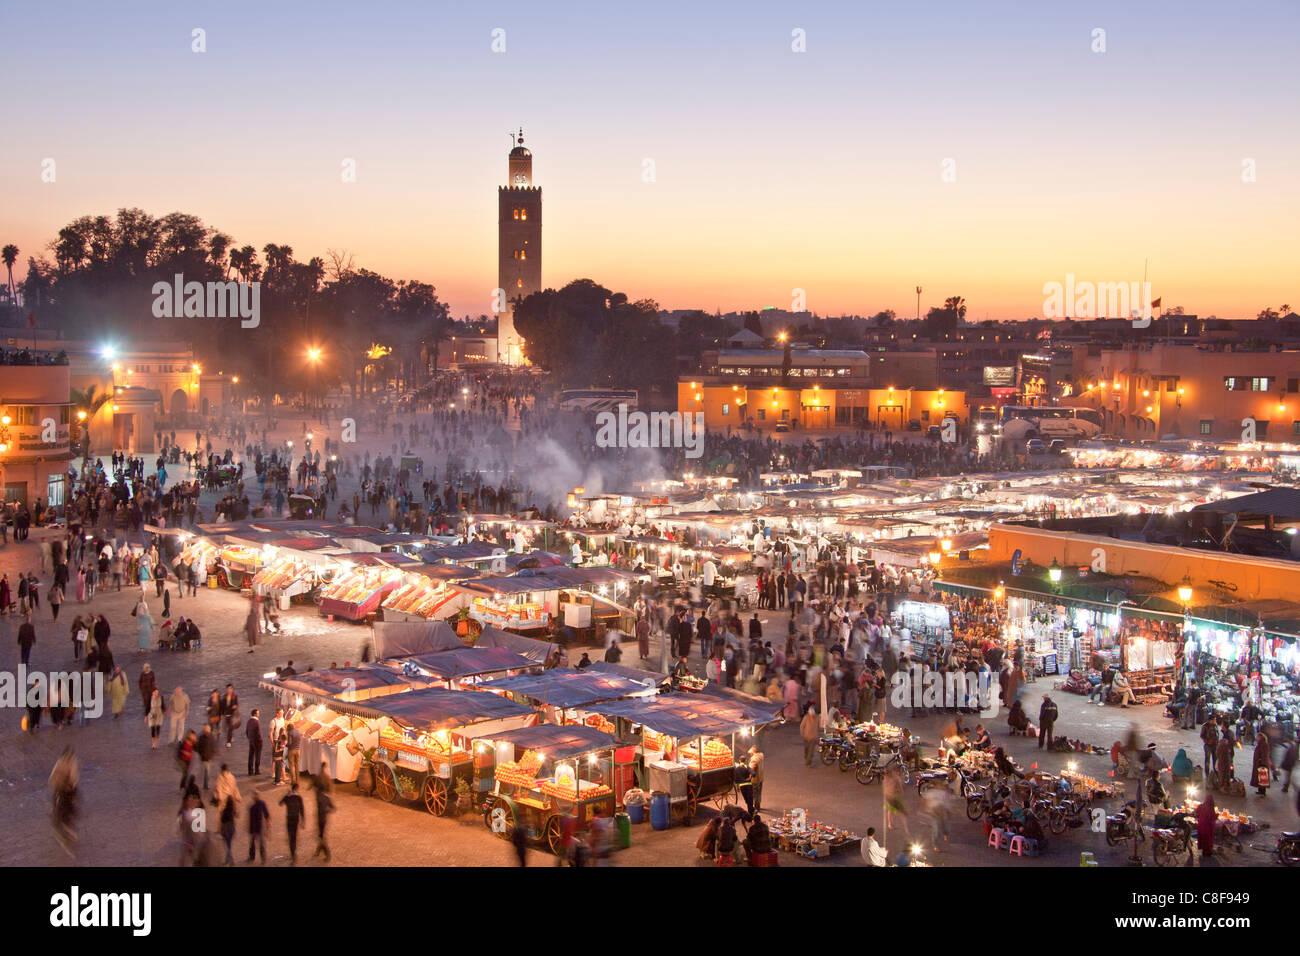 Il Marocco, Africa Settentrionale, Africa Marrakech, Medina, business, commercio, shop, Djemaa el Fna, luogo Koutobia, Immagini Stock